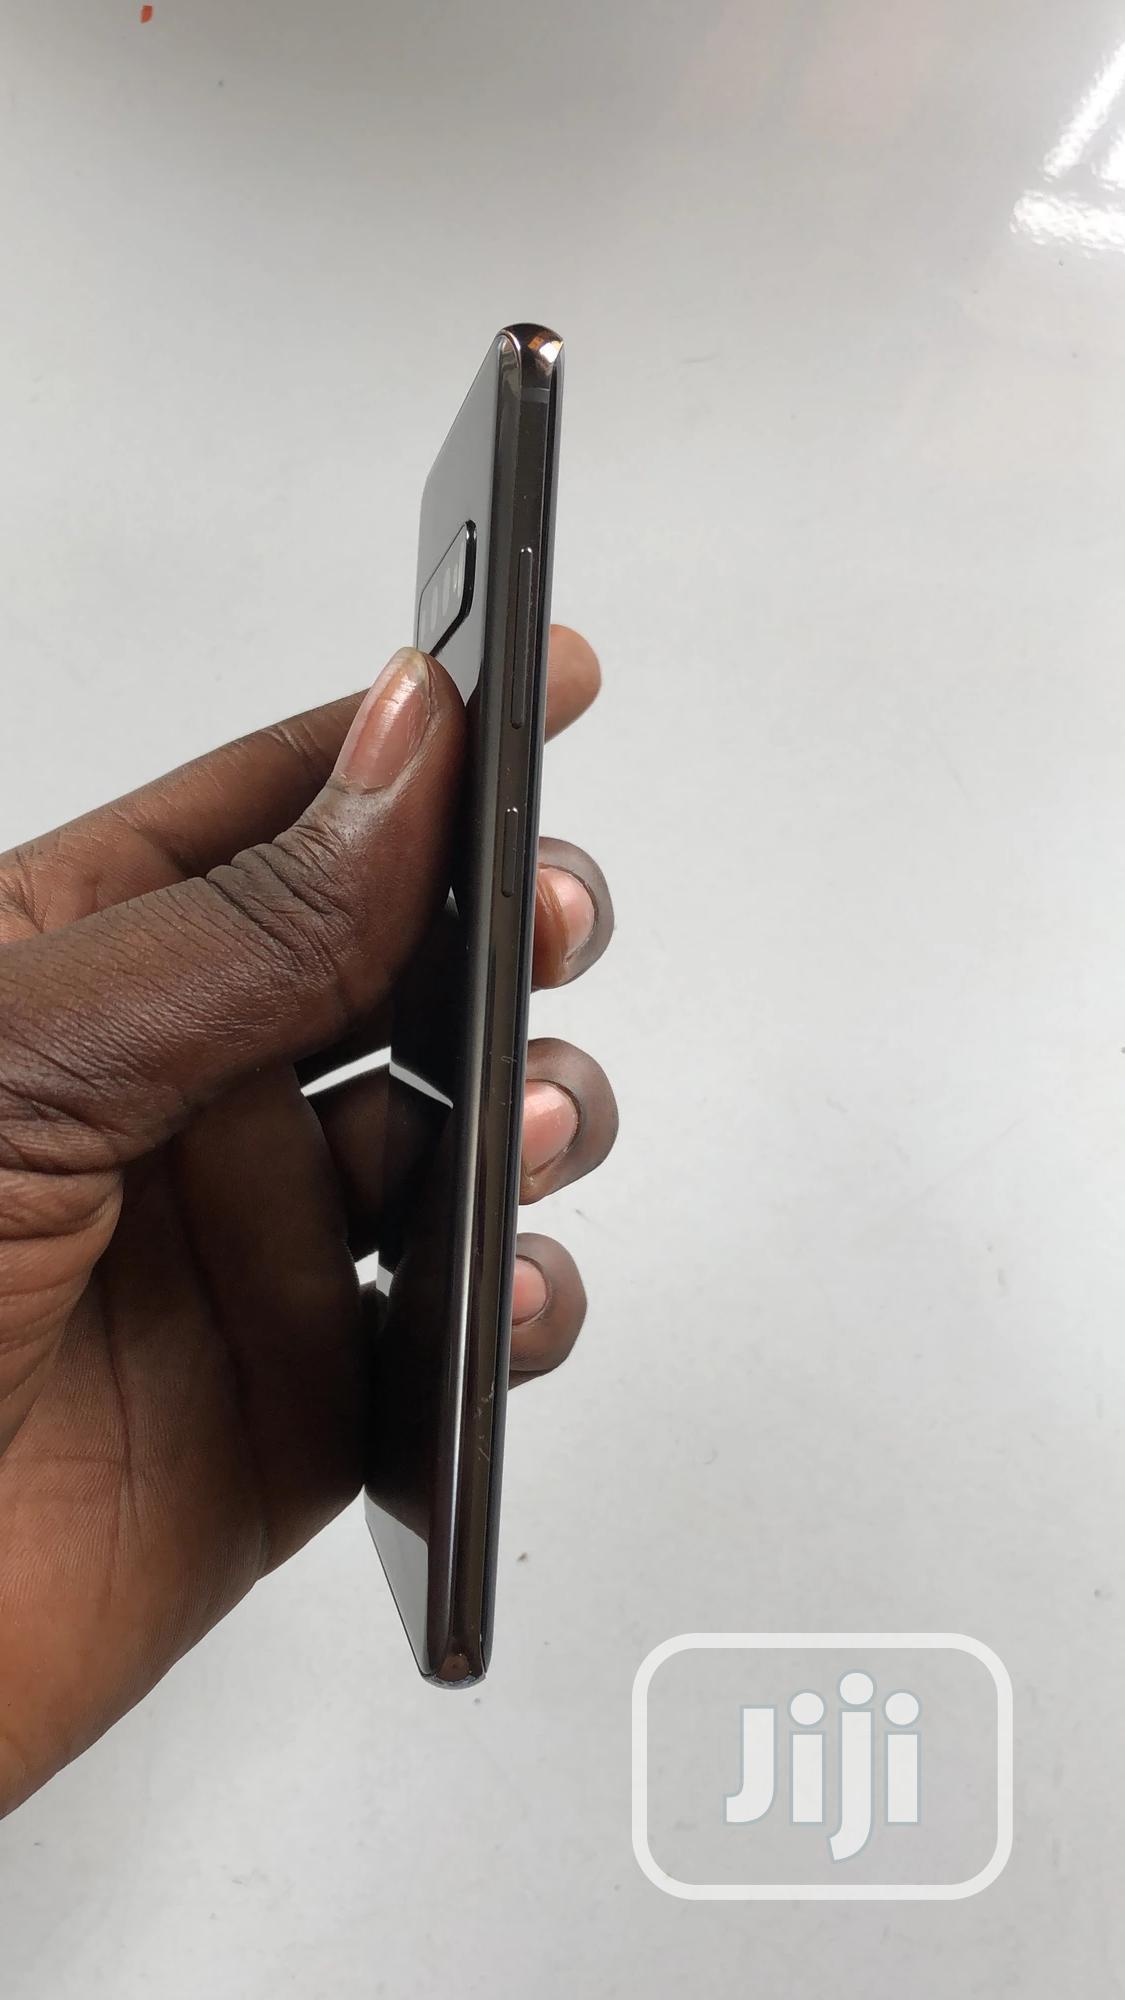 Samsung Galaxy S10 Plus 128 GB Black | Mobile Phones for sale in Warri, Delta State, Nigeria